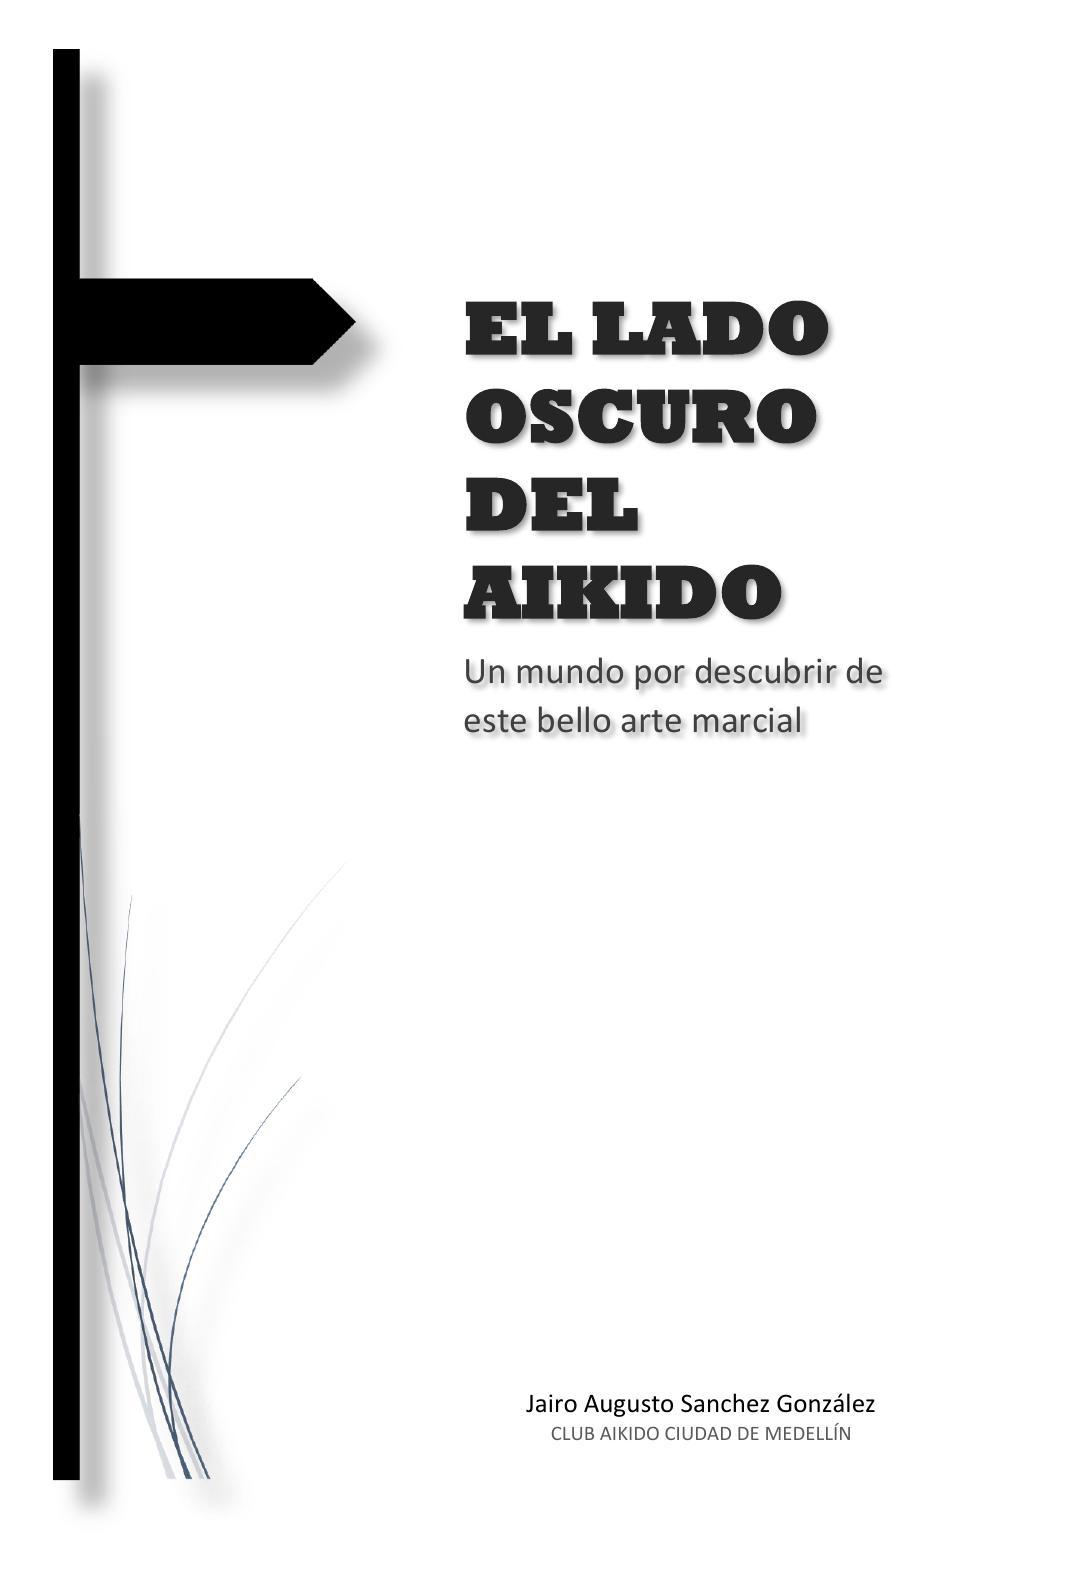 LADO OSCURO DEL AIKIDO